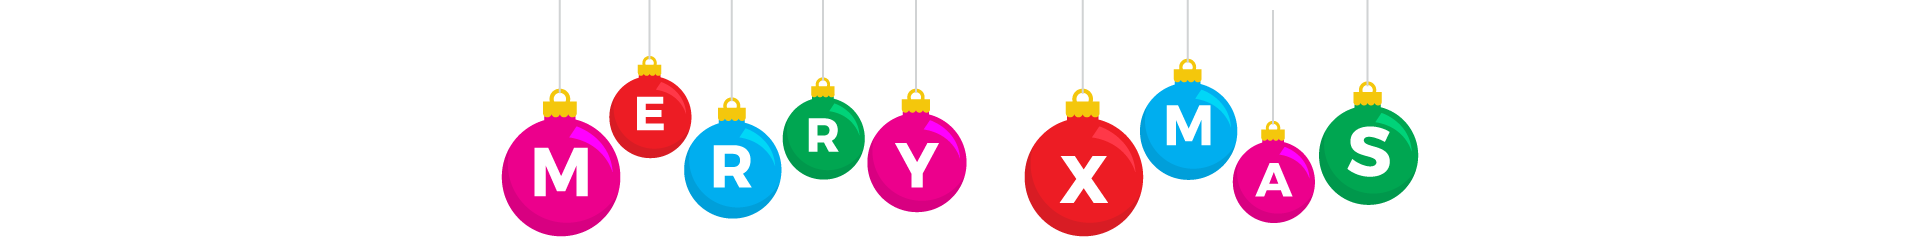 Merry-Xmas-Header-v2.png